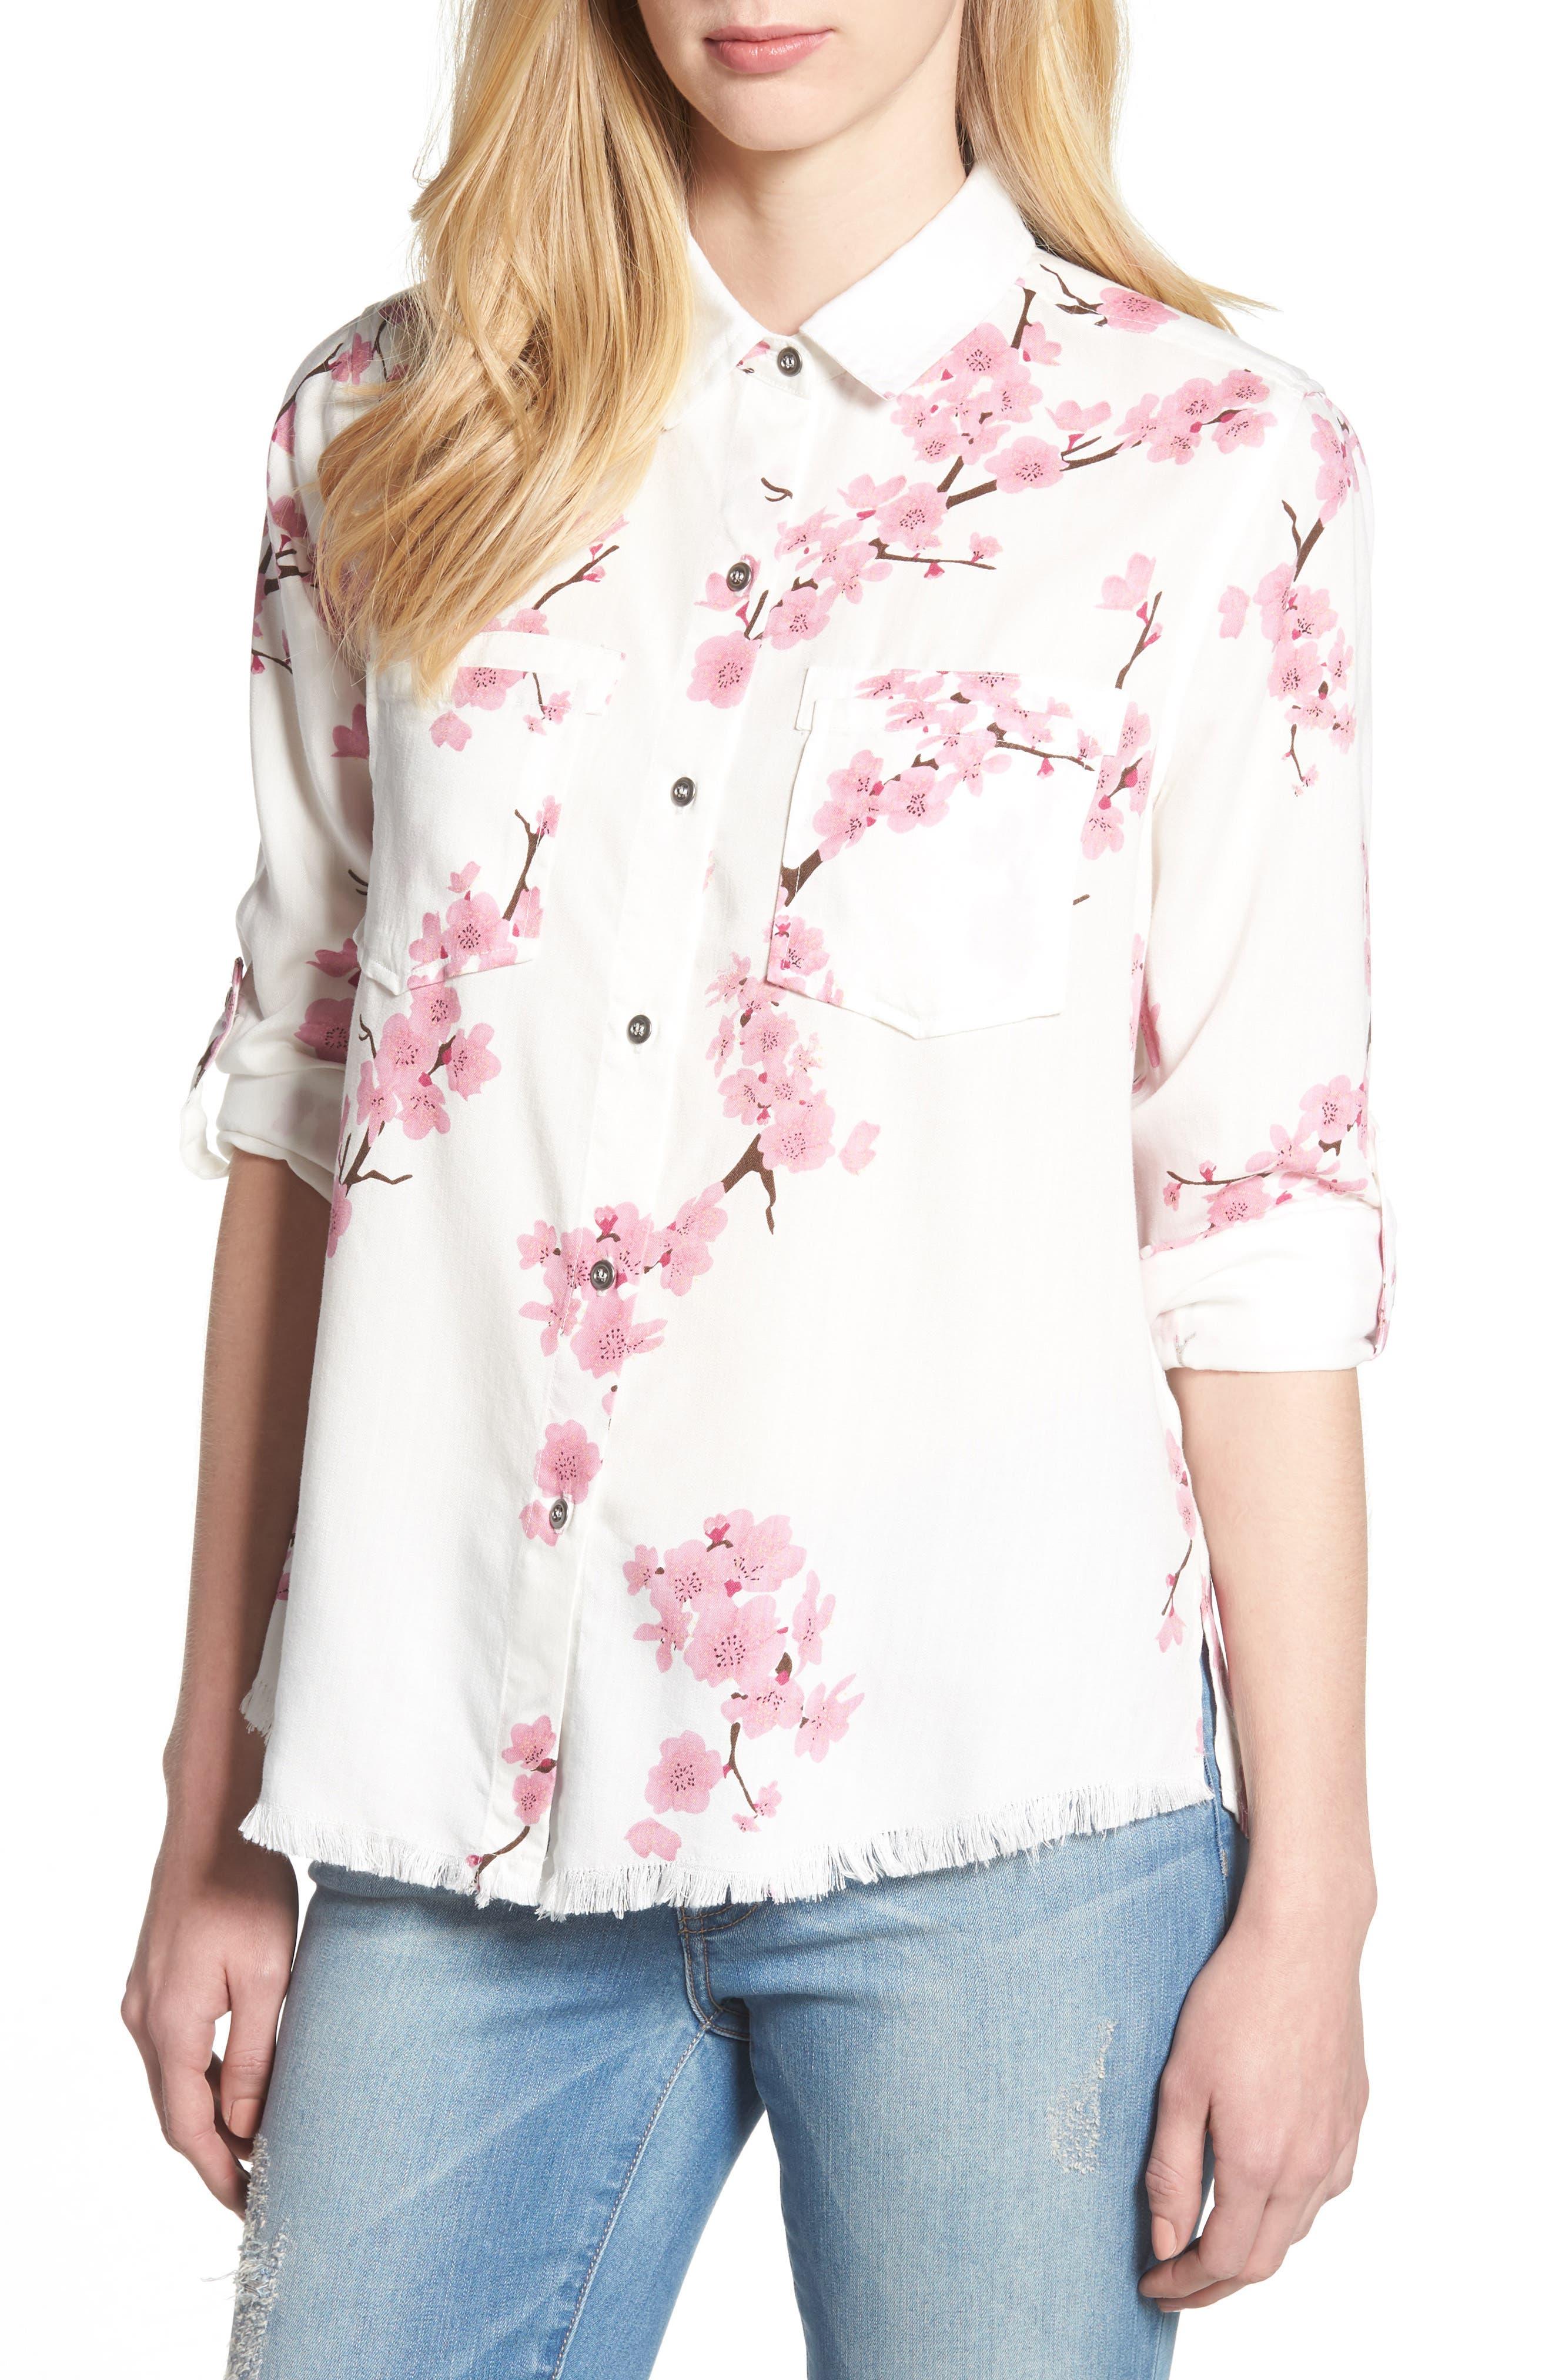 Cherry Blossom Roll Tab Sleeve Shirt,                             Main thumbnail 1, color,                             White Cherry Blossom